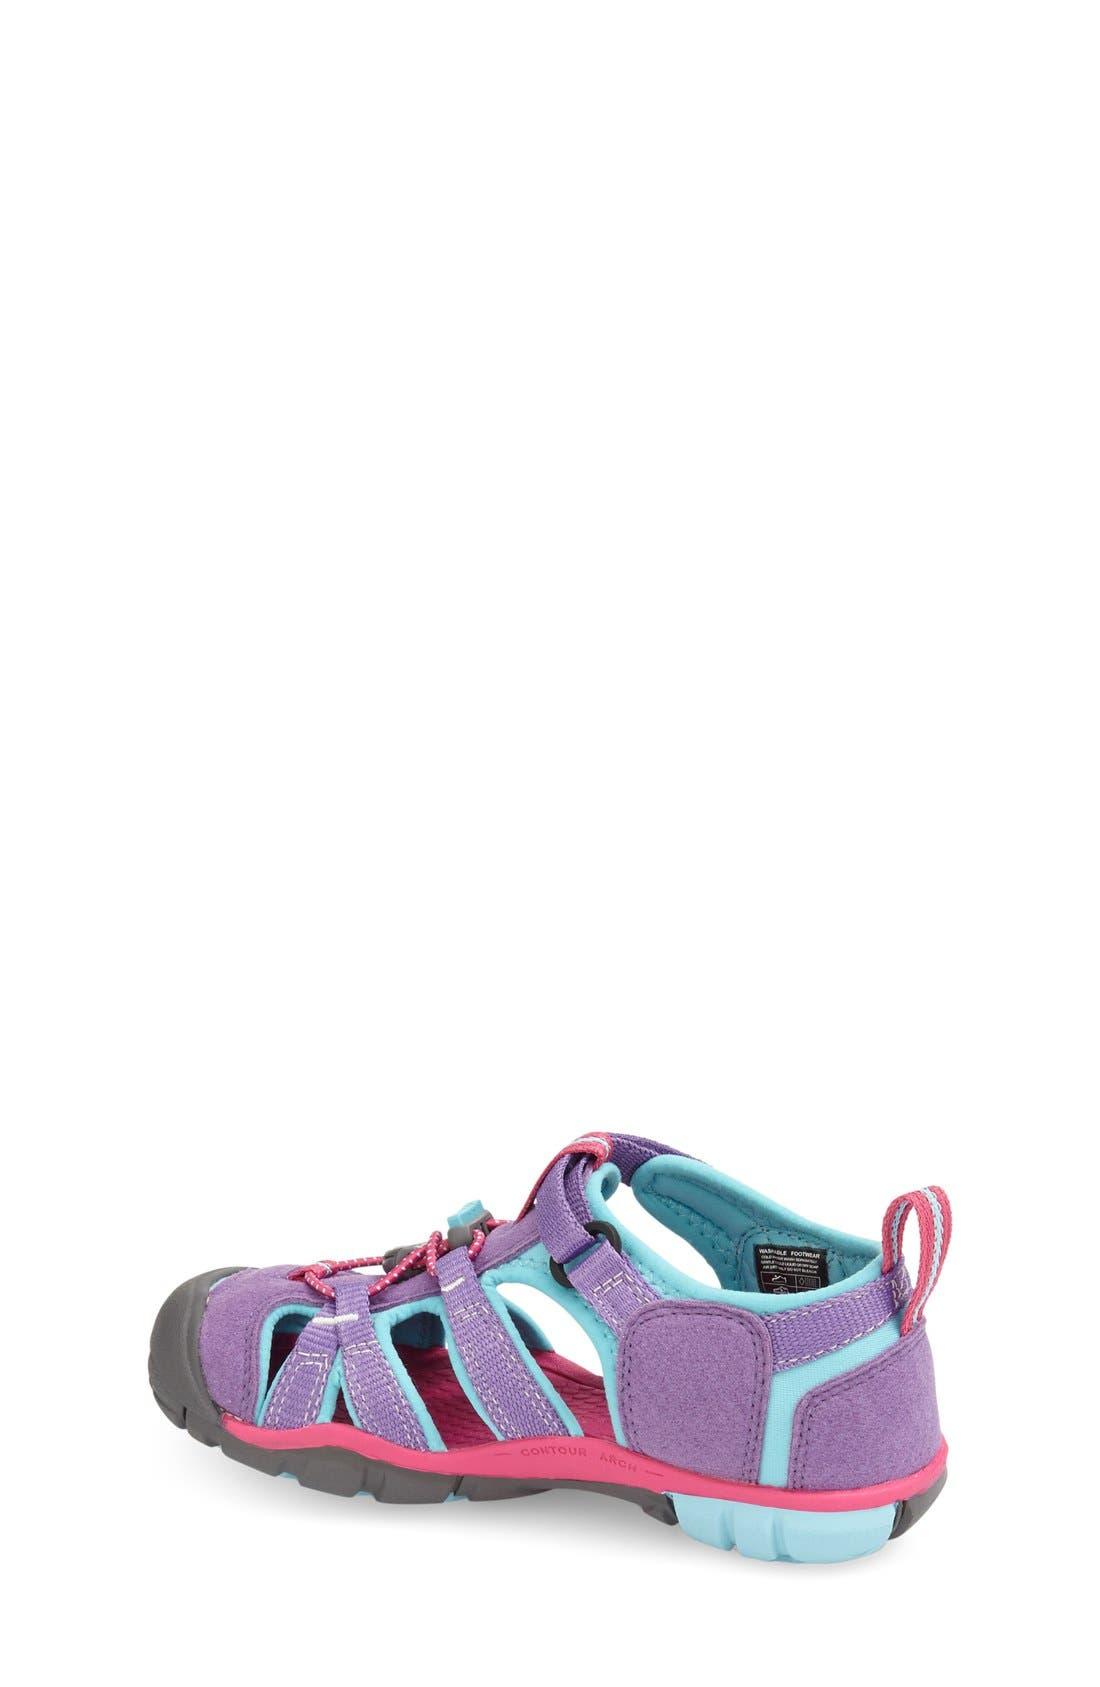 ,                             'Seacamp II' Water Friendly Sandal,                             Alternate thumbnail 213, color,                             500